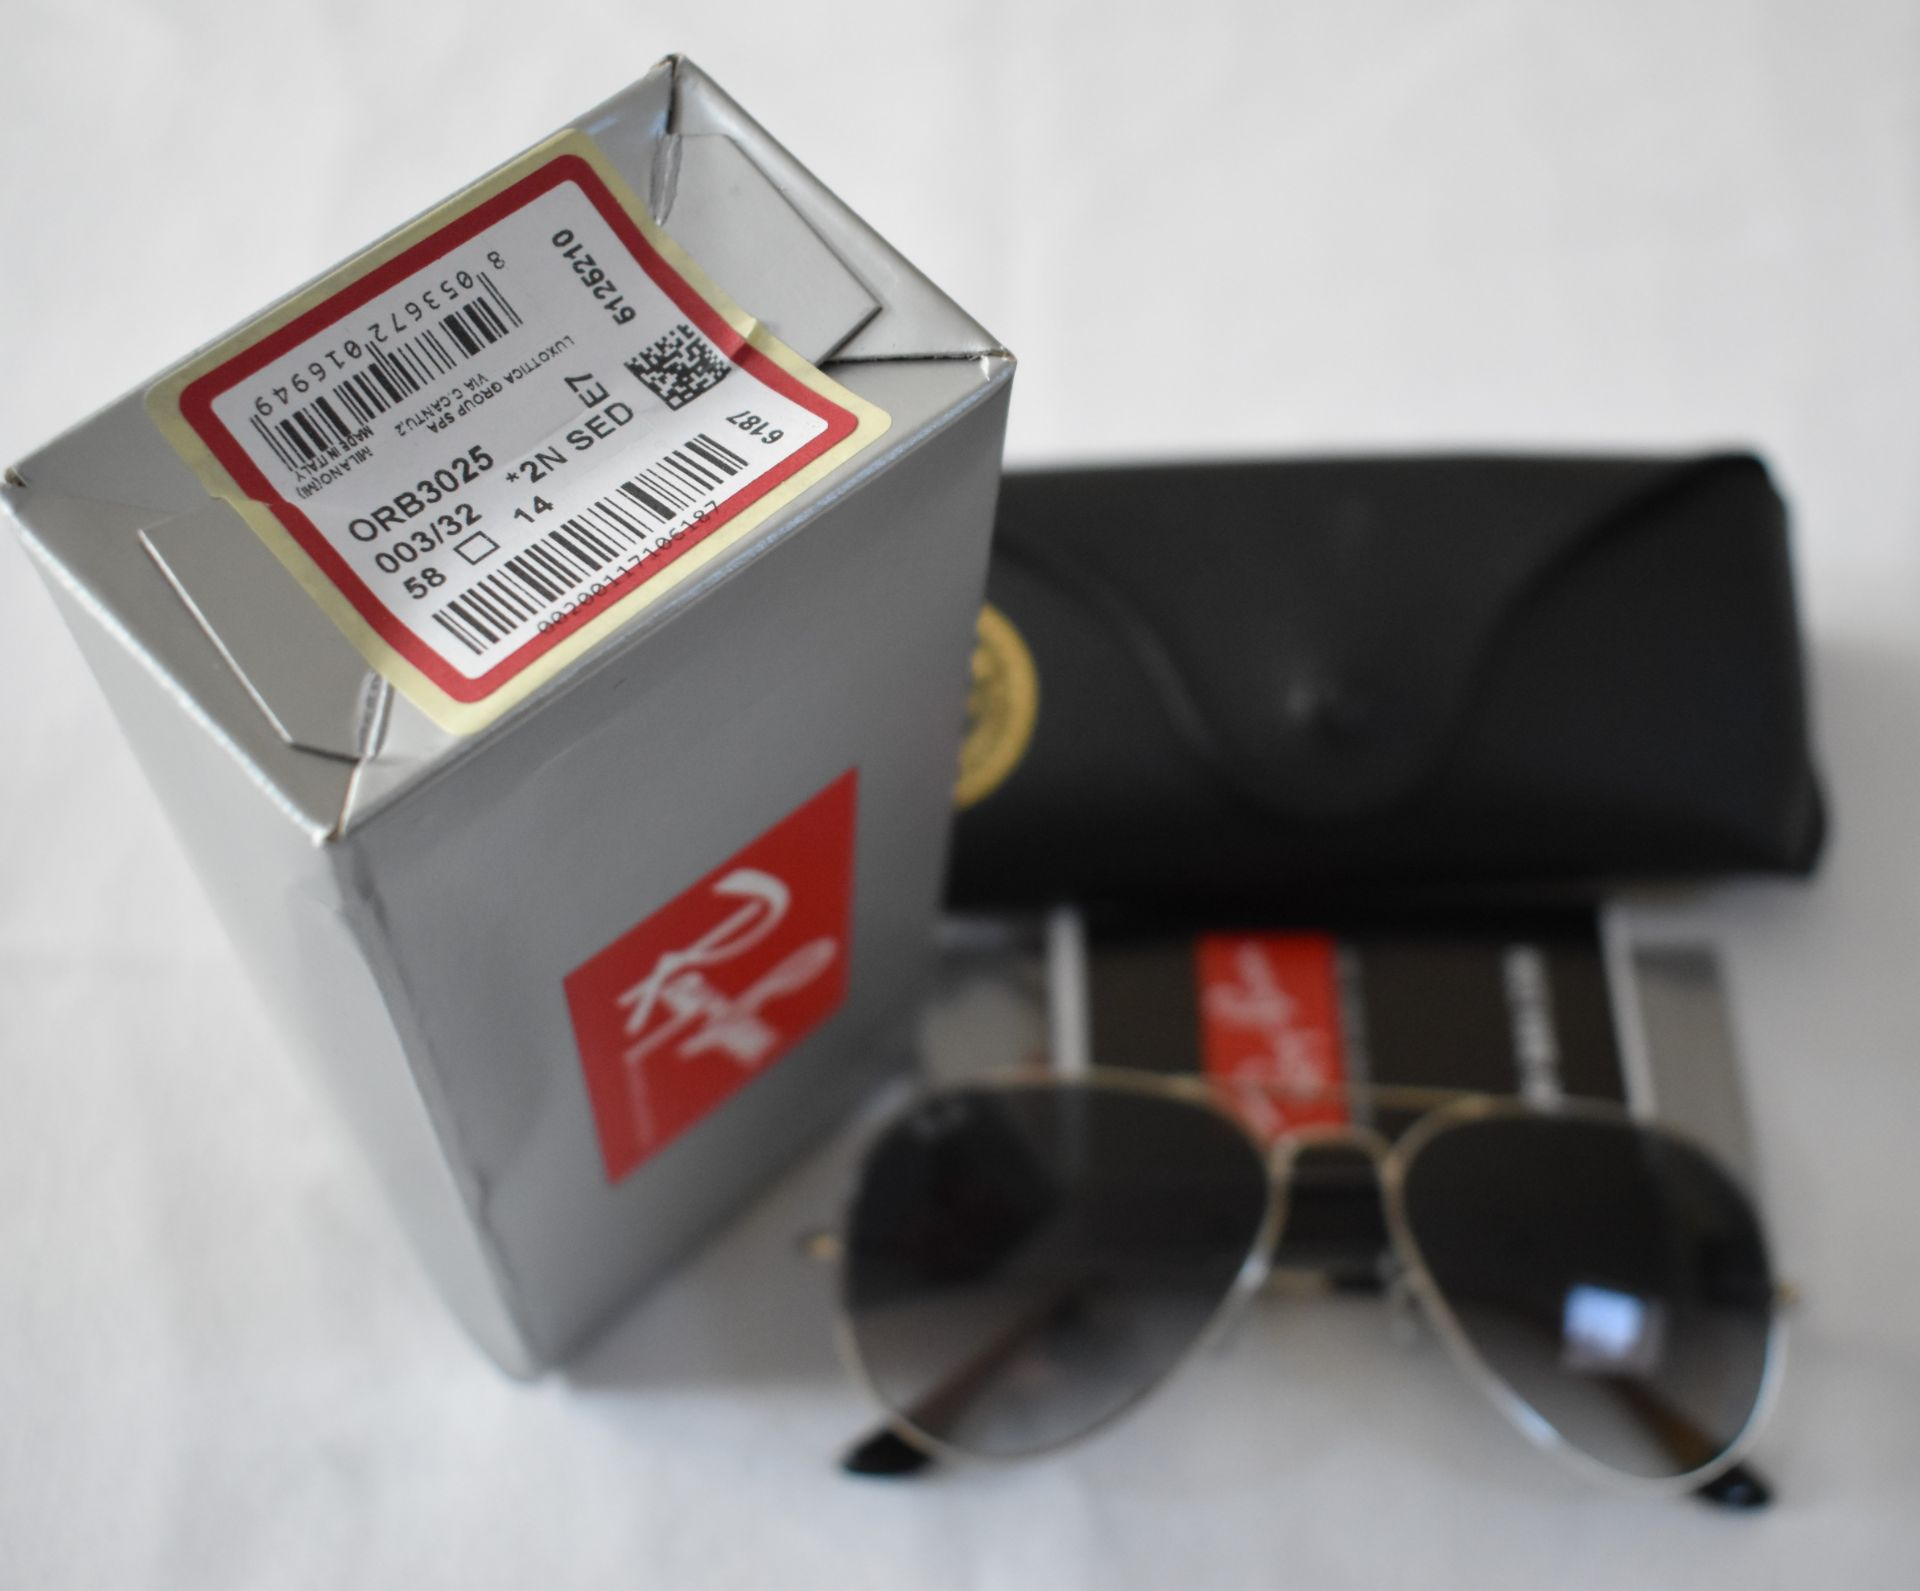 Ray Ban Sunglasses ORB3025 003/32 *2N - Image 2 of 2